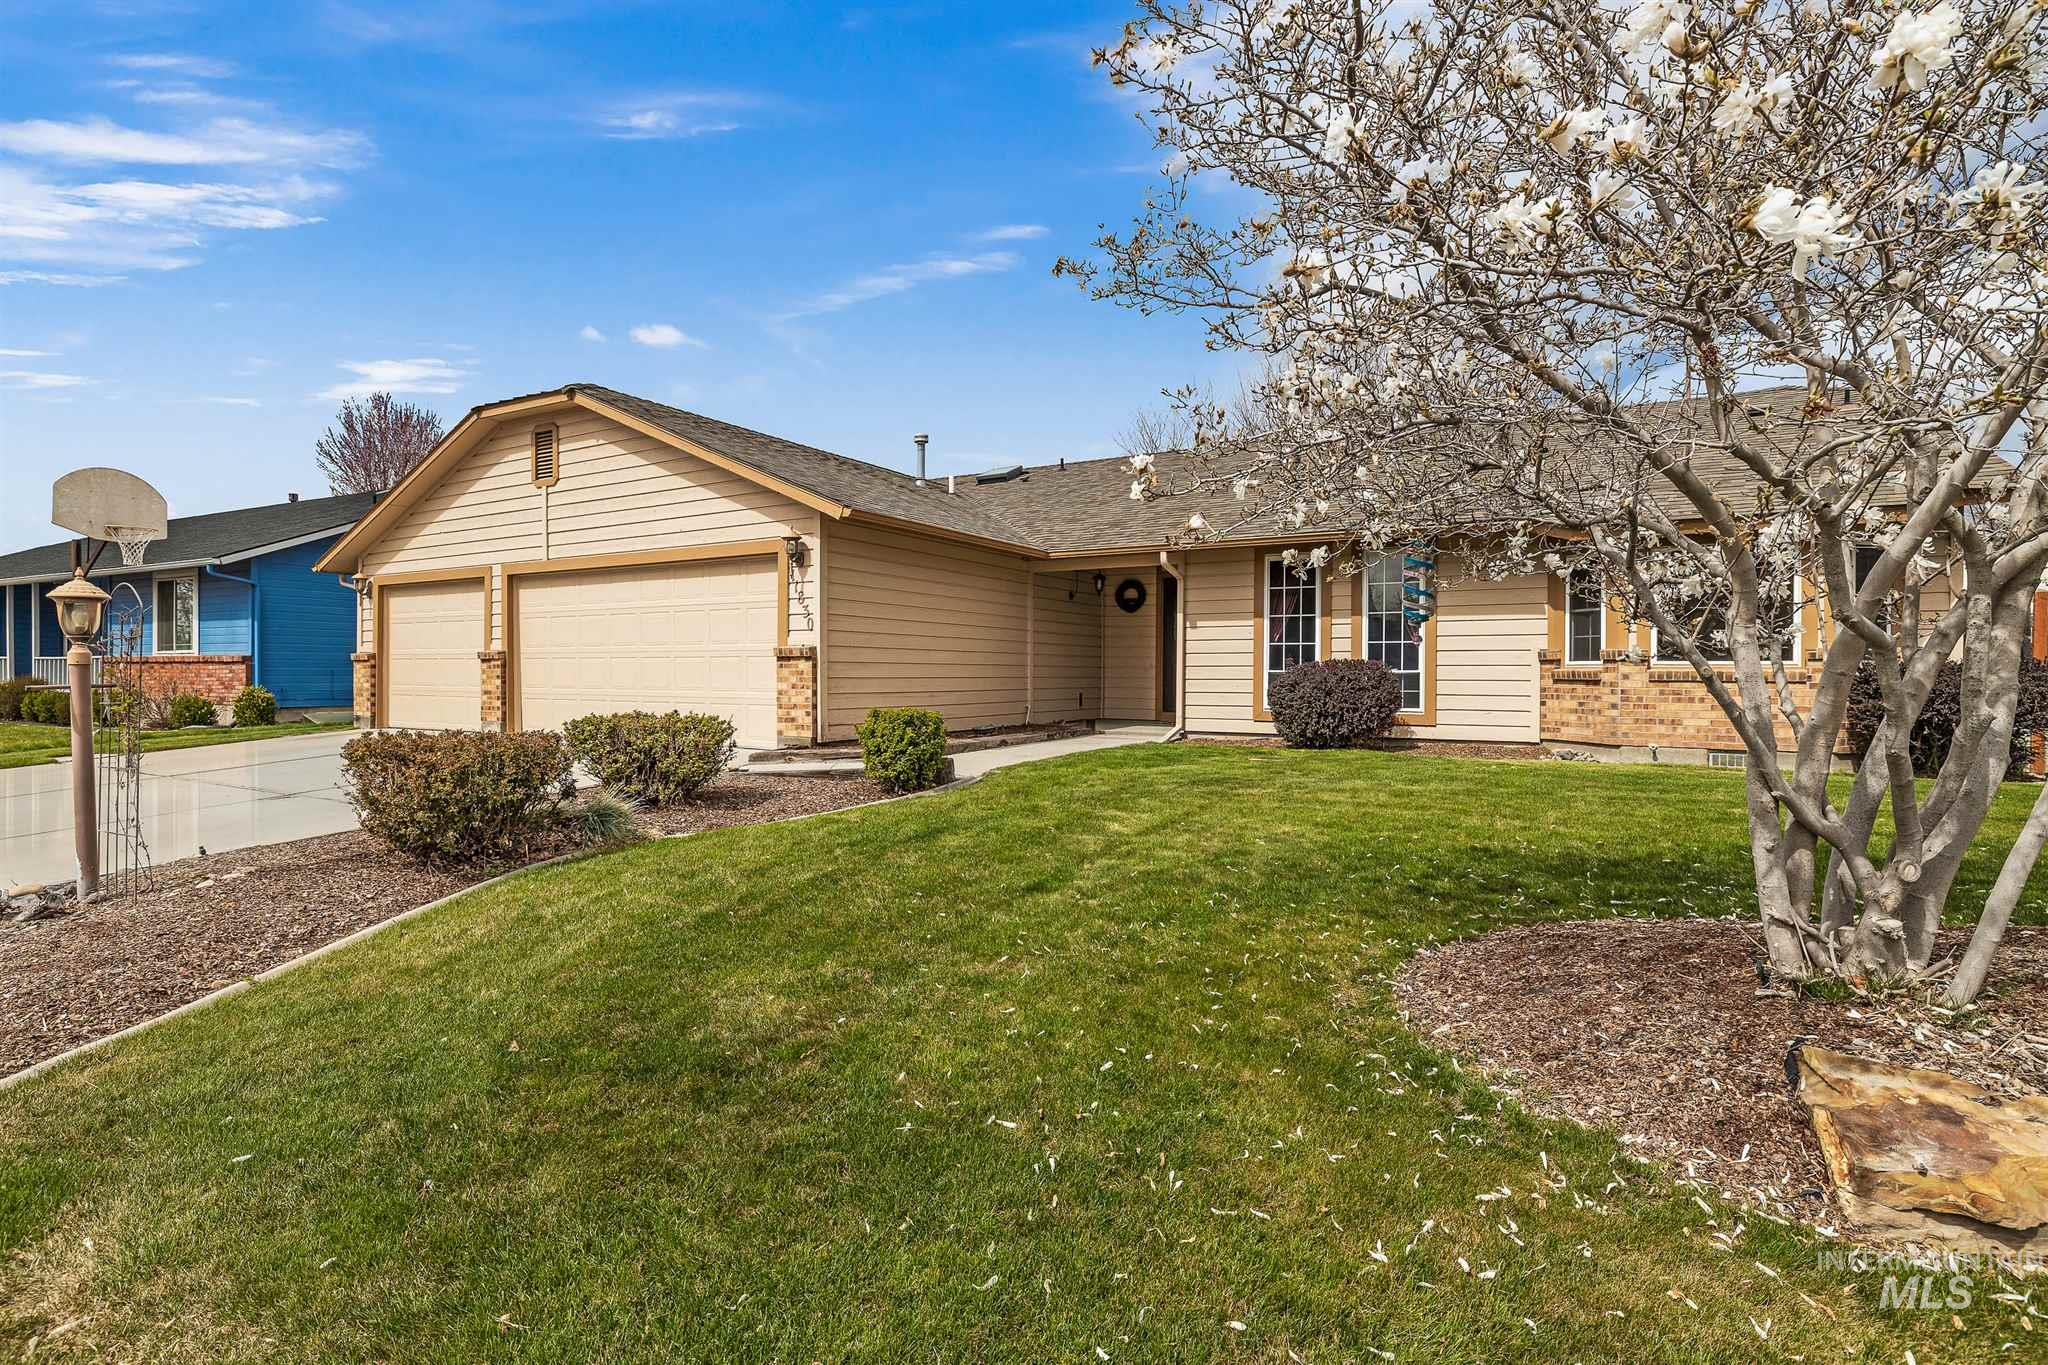 11830 W FLINTLOCK Property Photo - Boise, ID real estate listing